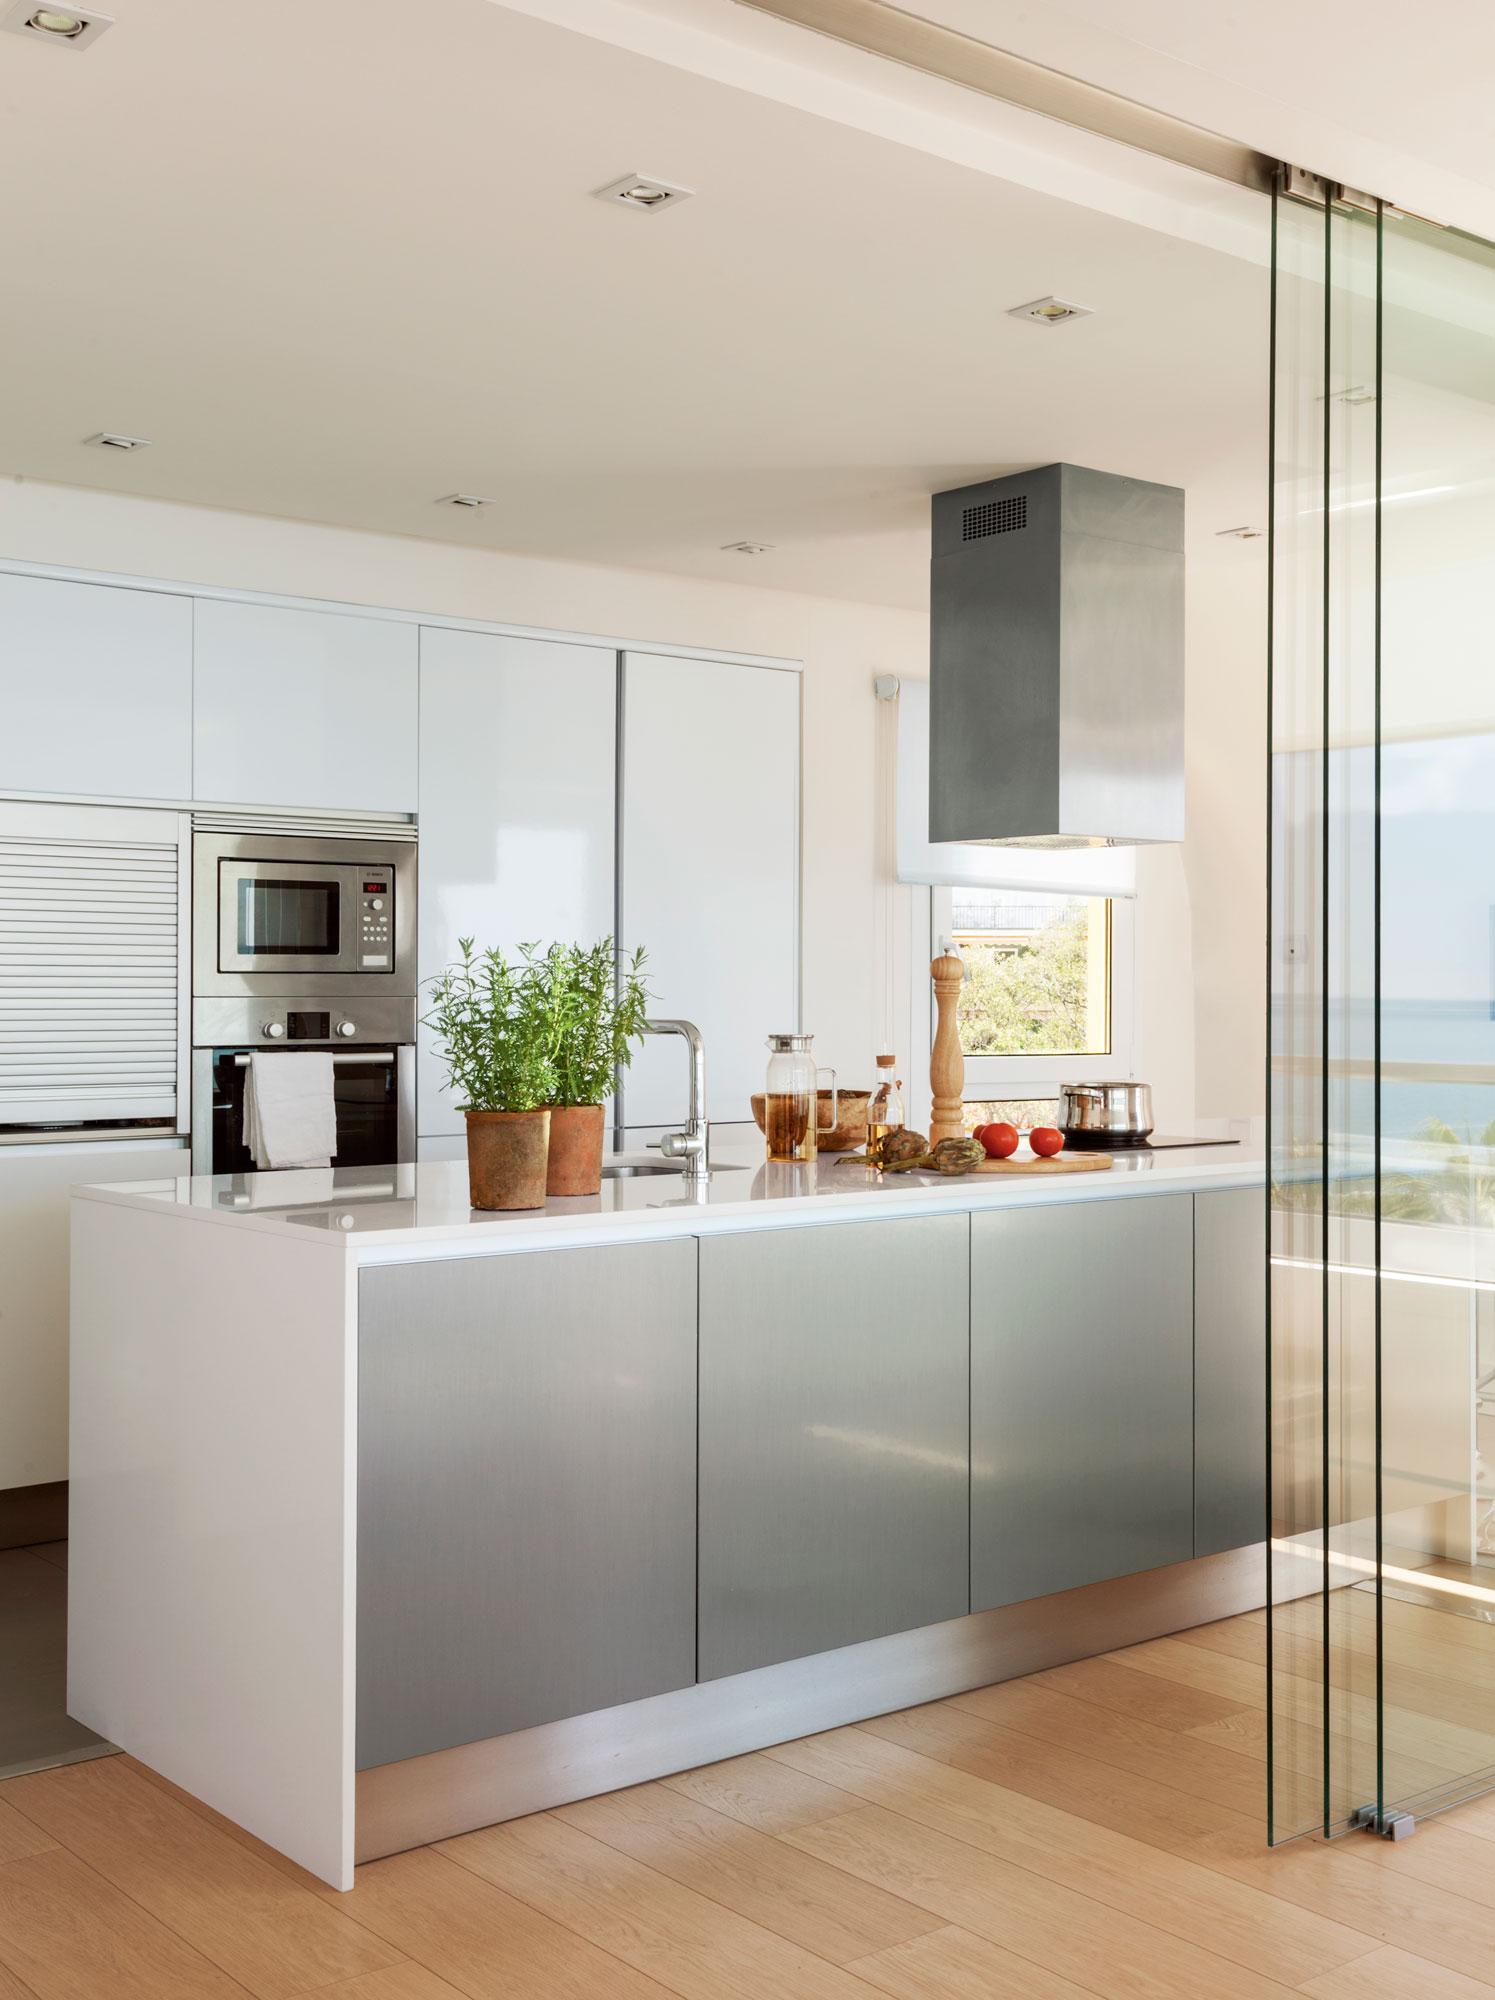 Puertas correderas de cristal de madera o empotradas - Cocinas de cristal ...